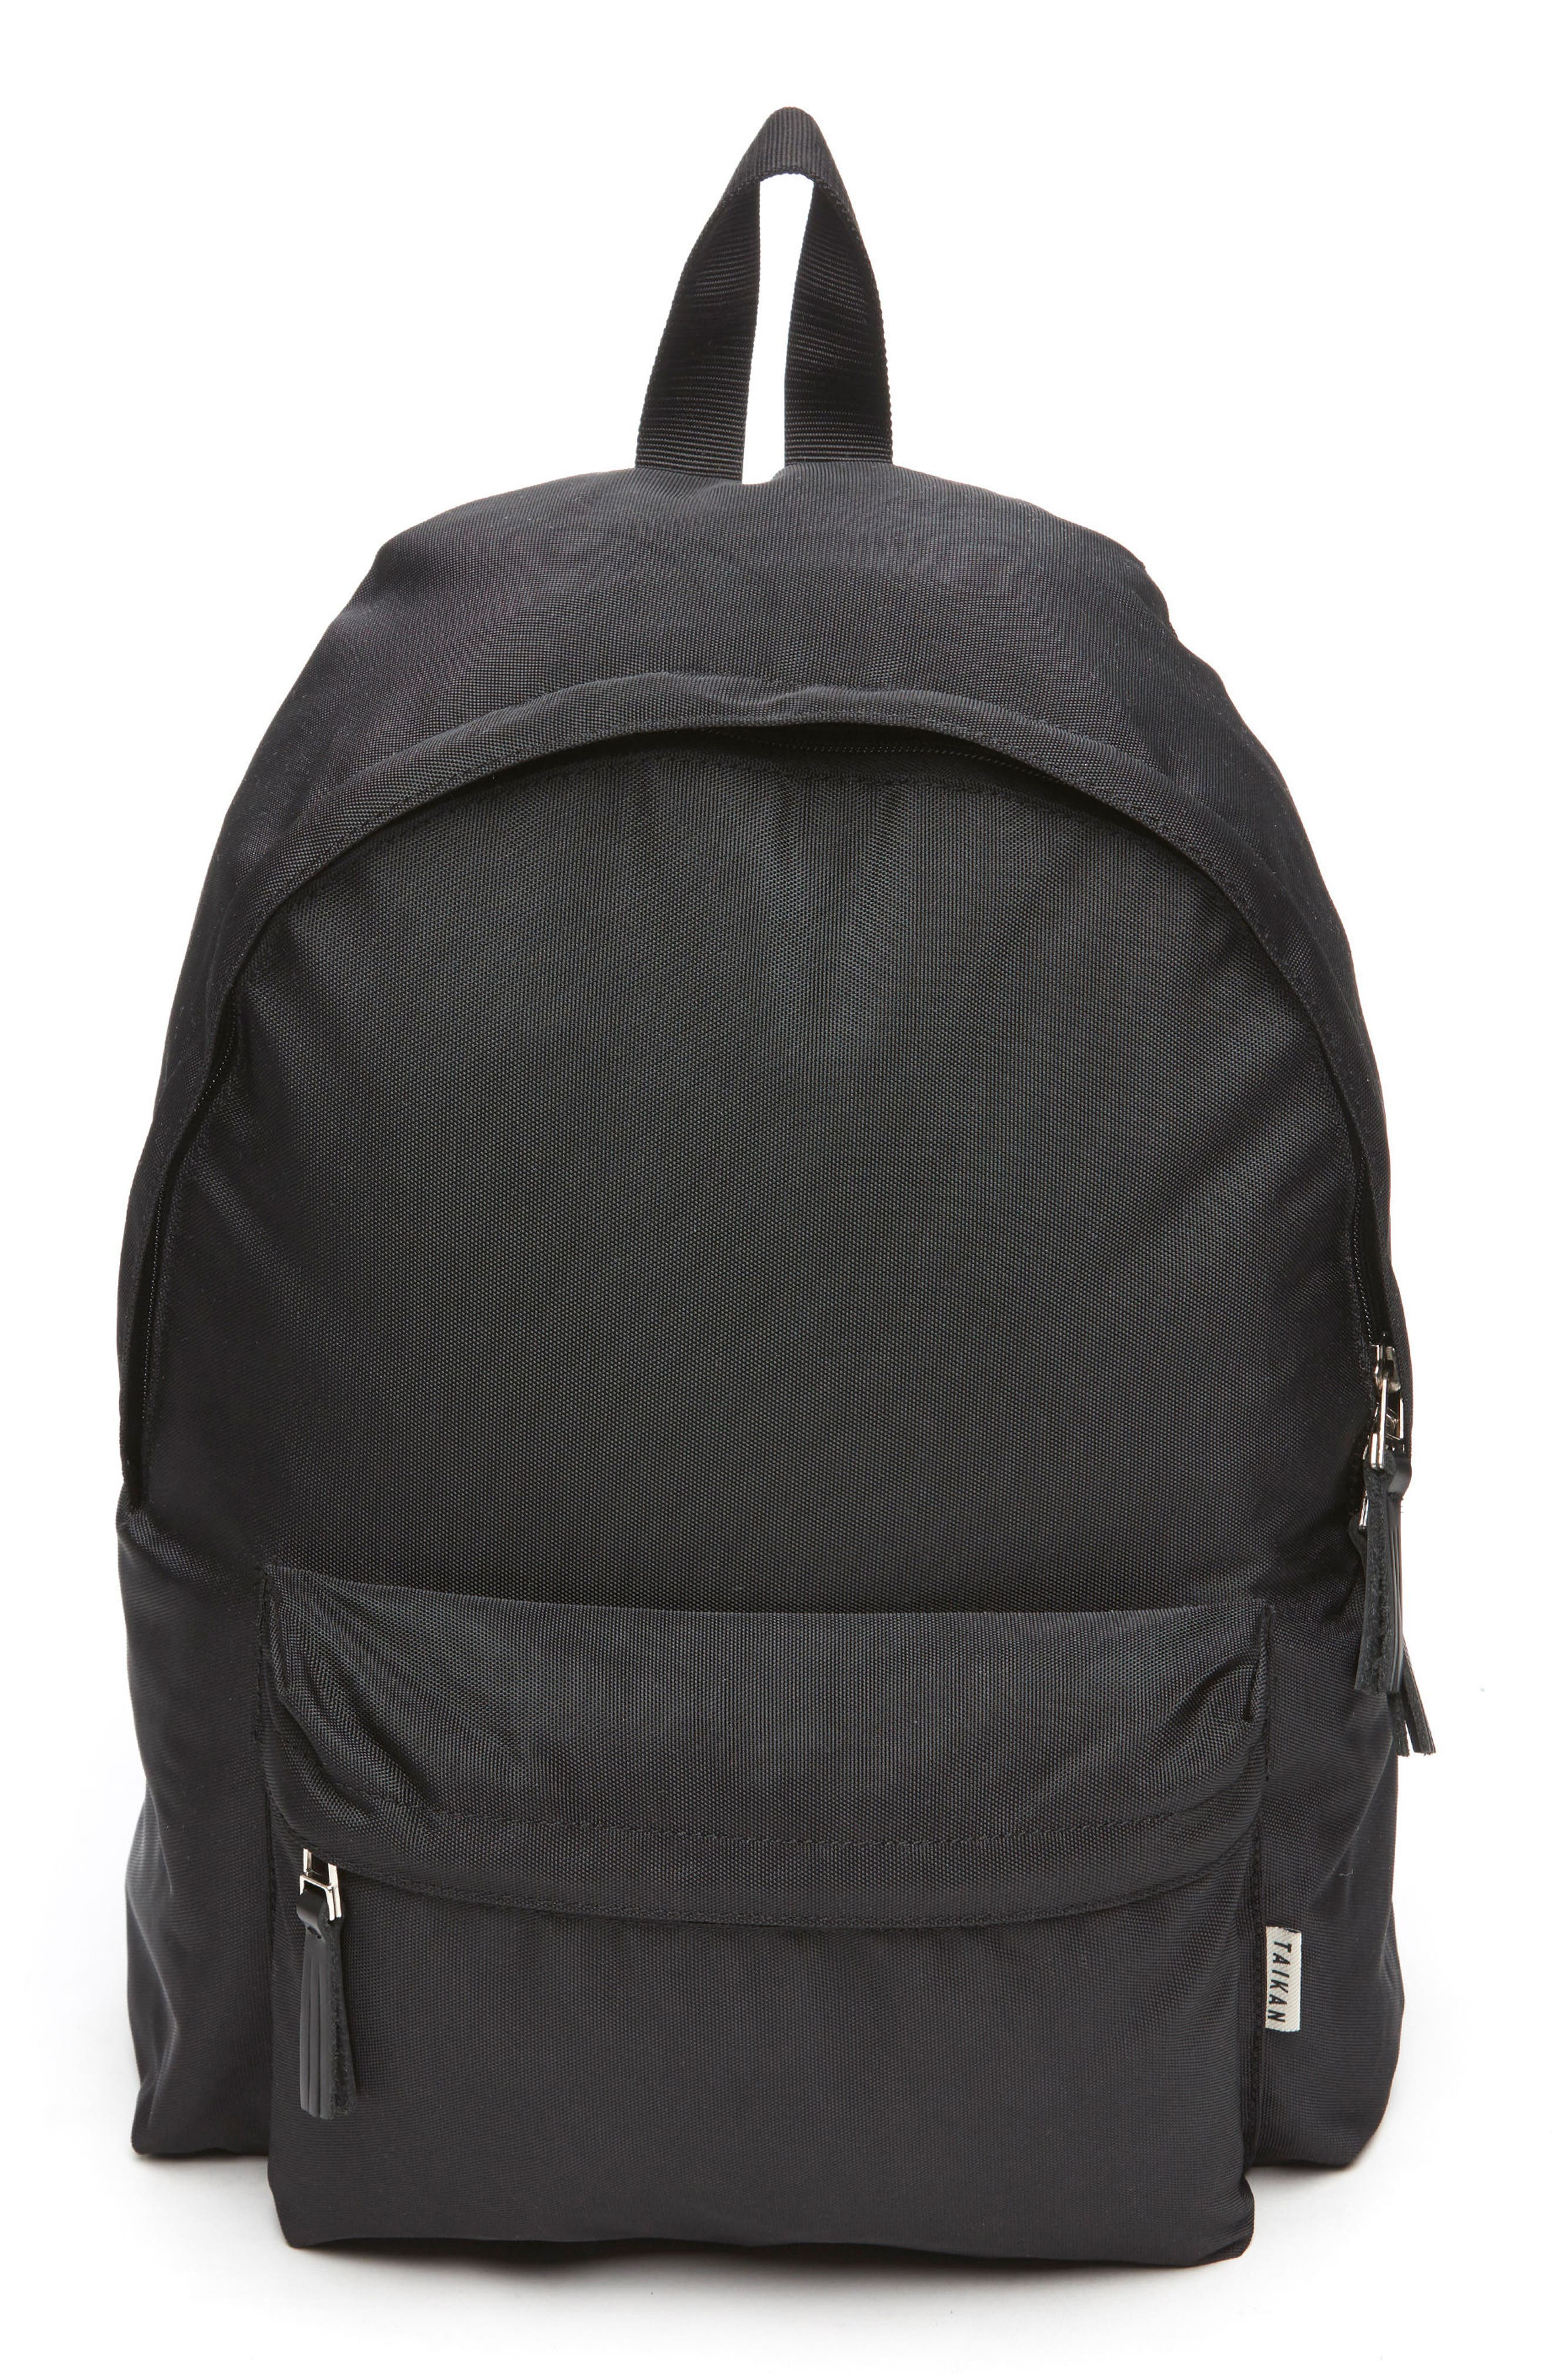 Hornet Backpack,                             Main thumbnail 1, color,                             MATTE BLACK